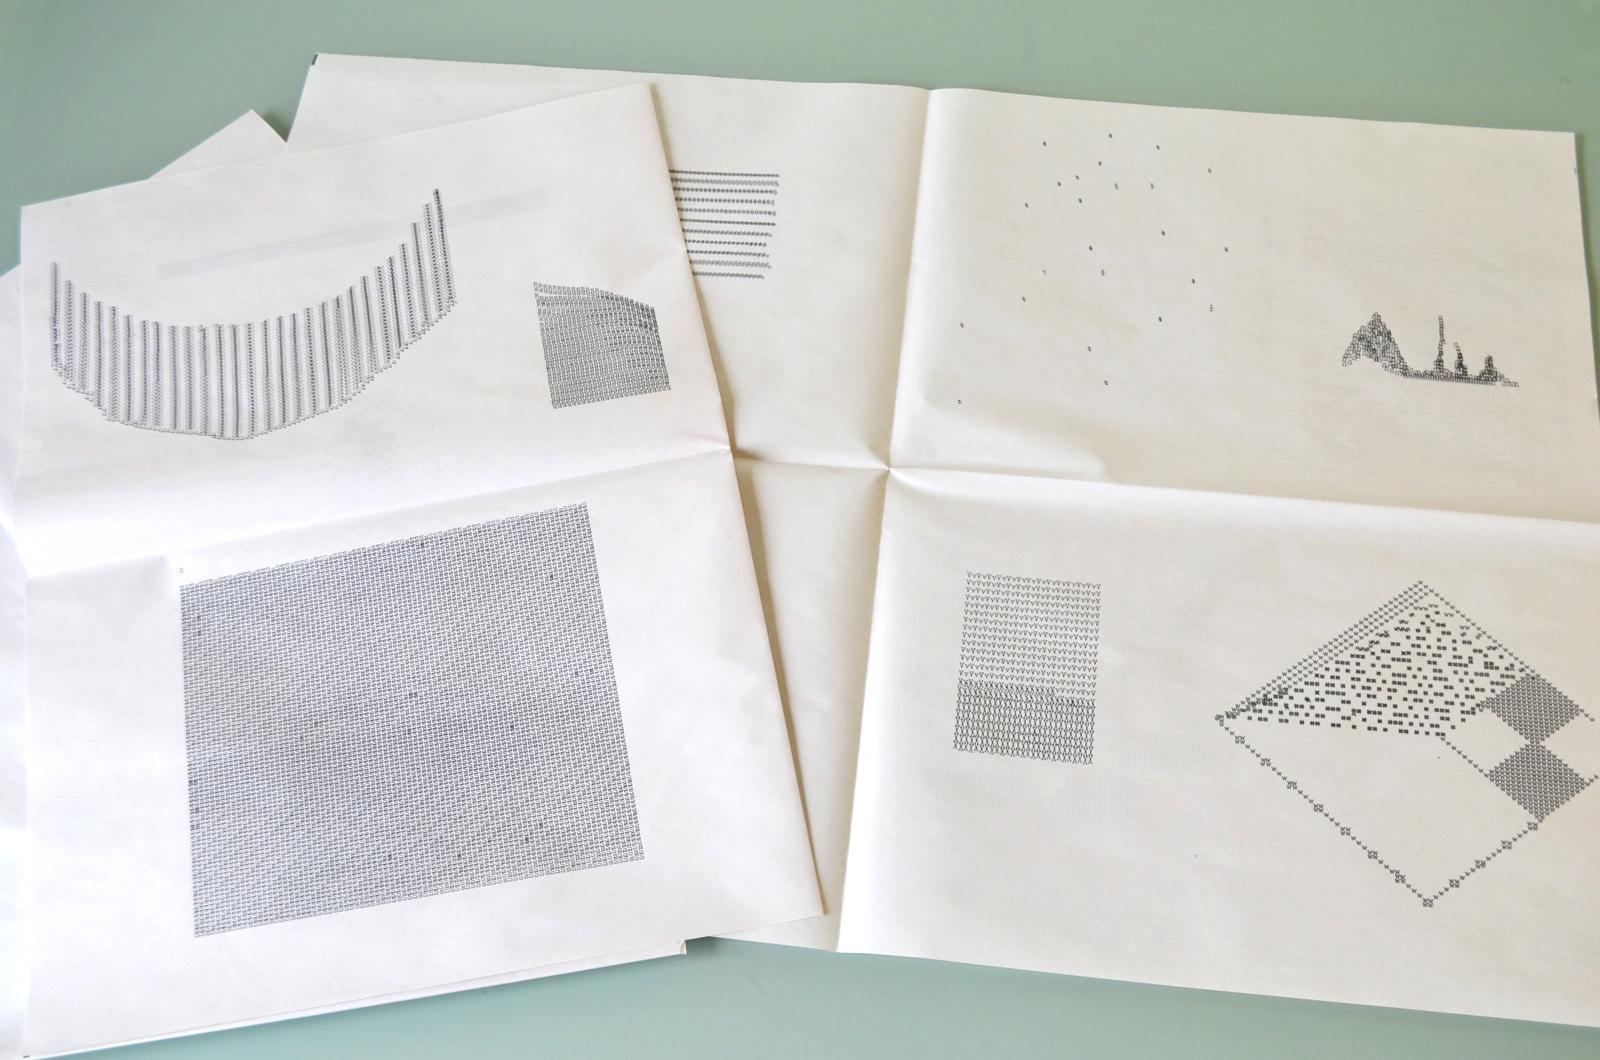 alphabet . broad sheet, drawings typed on smith corona- coronet super 12, 2017